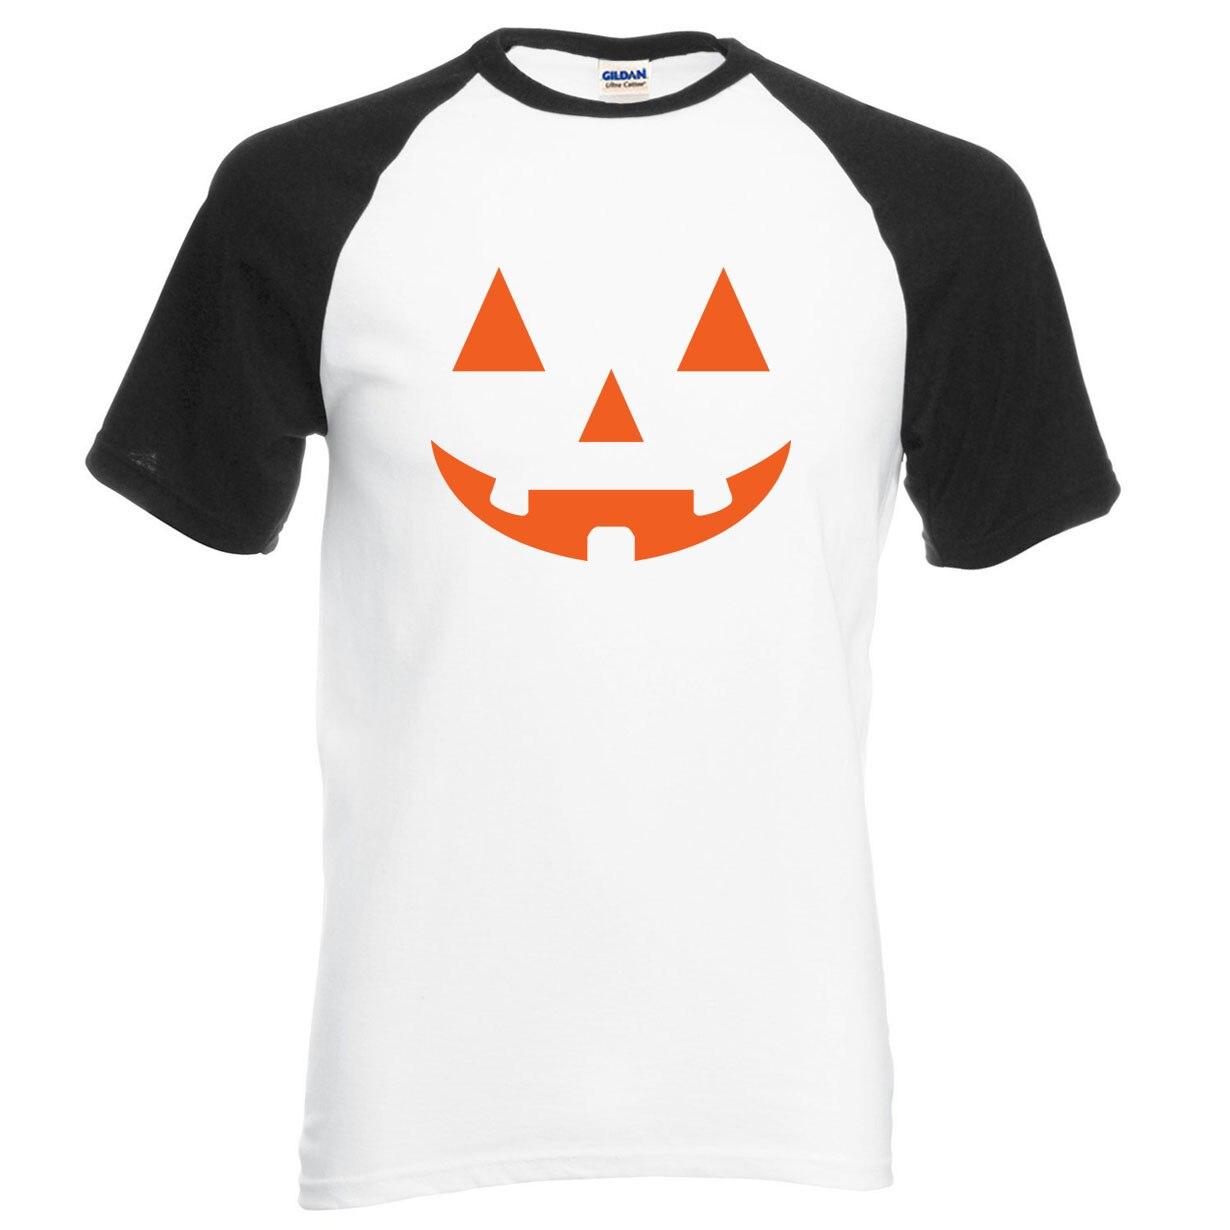 JACK O'Lantern Pumpkin Halloween 2019 new summer t shirt 100% cotton high quality raglan men t-shirt casual loose fit top tees